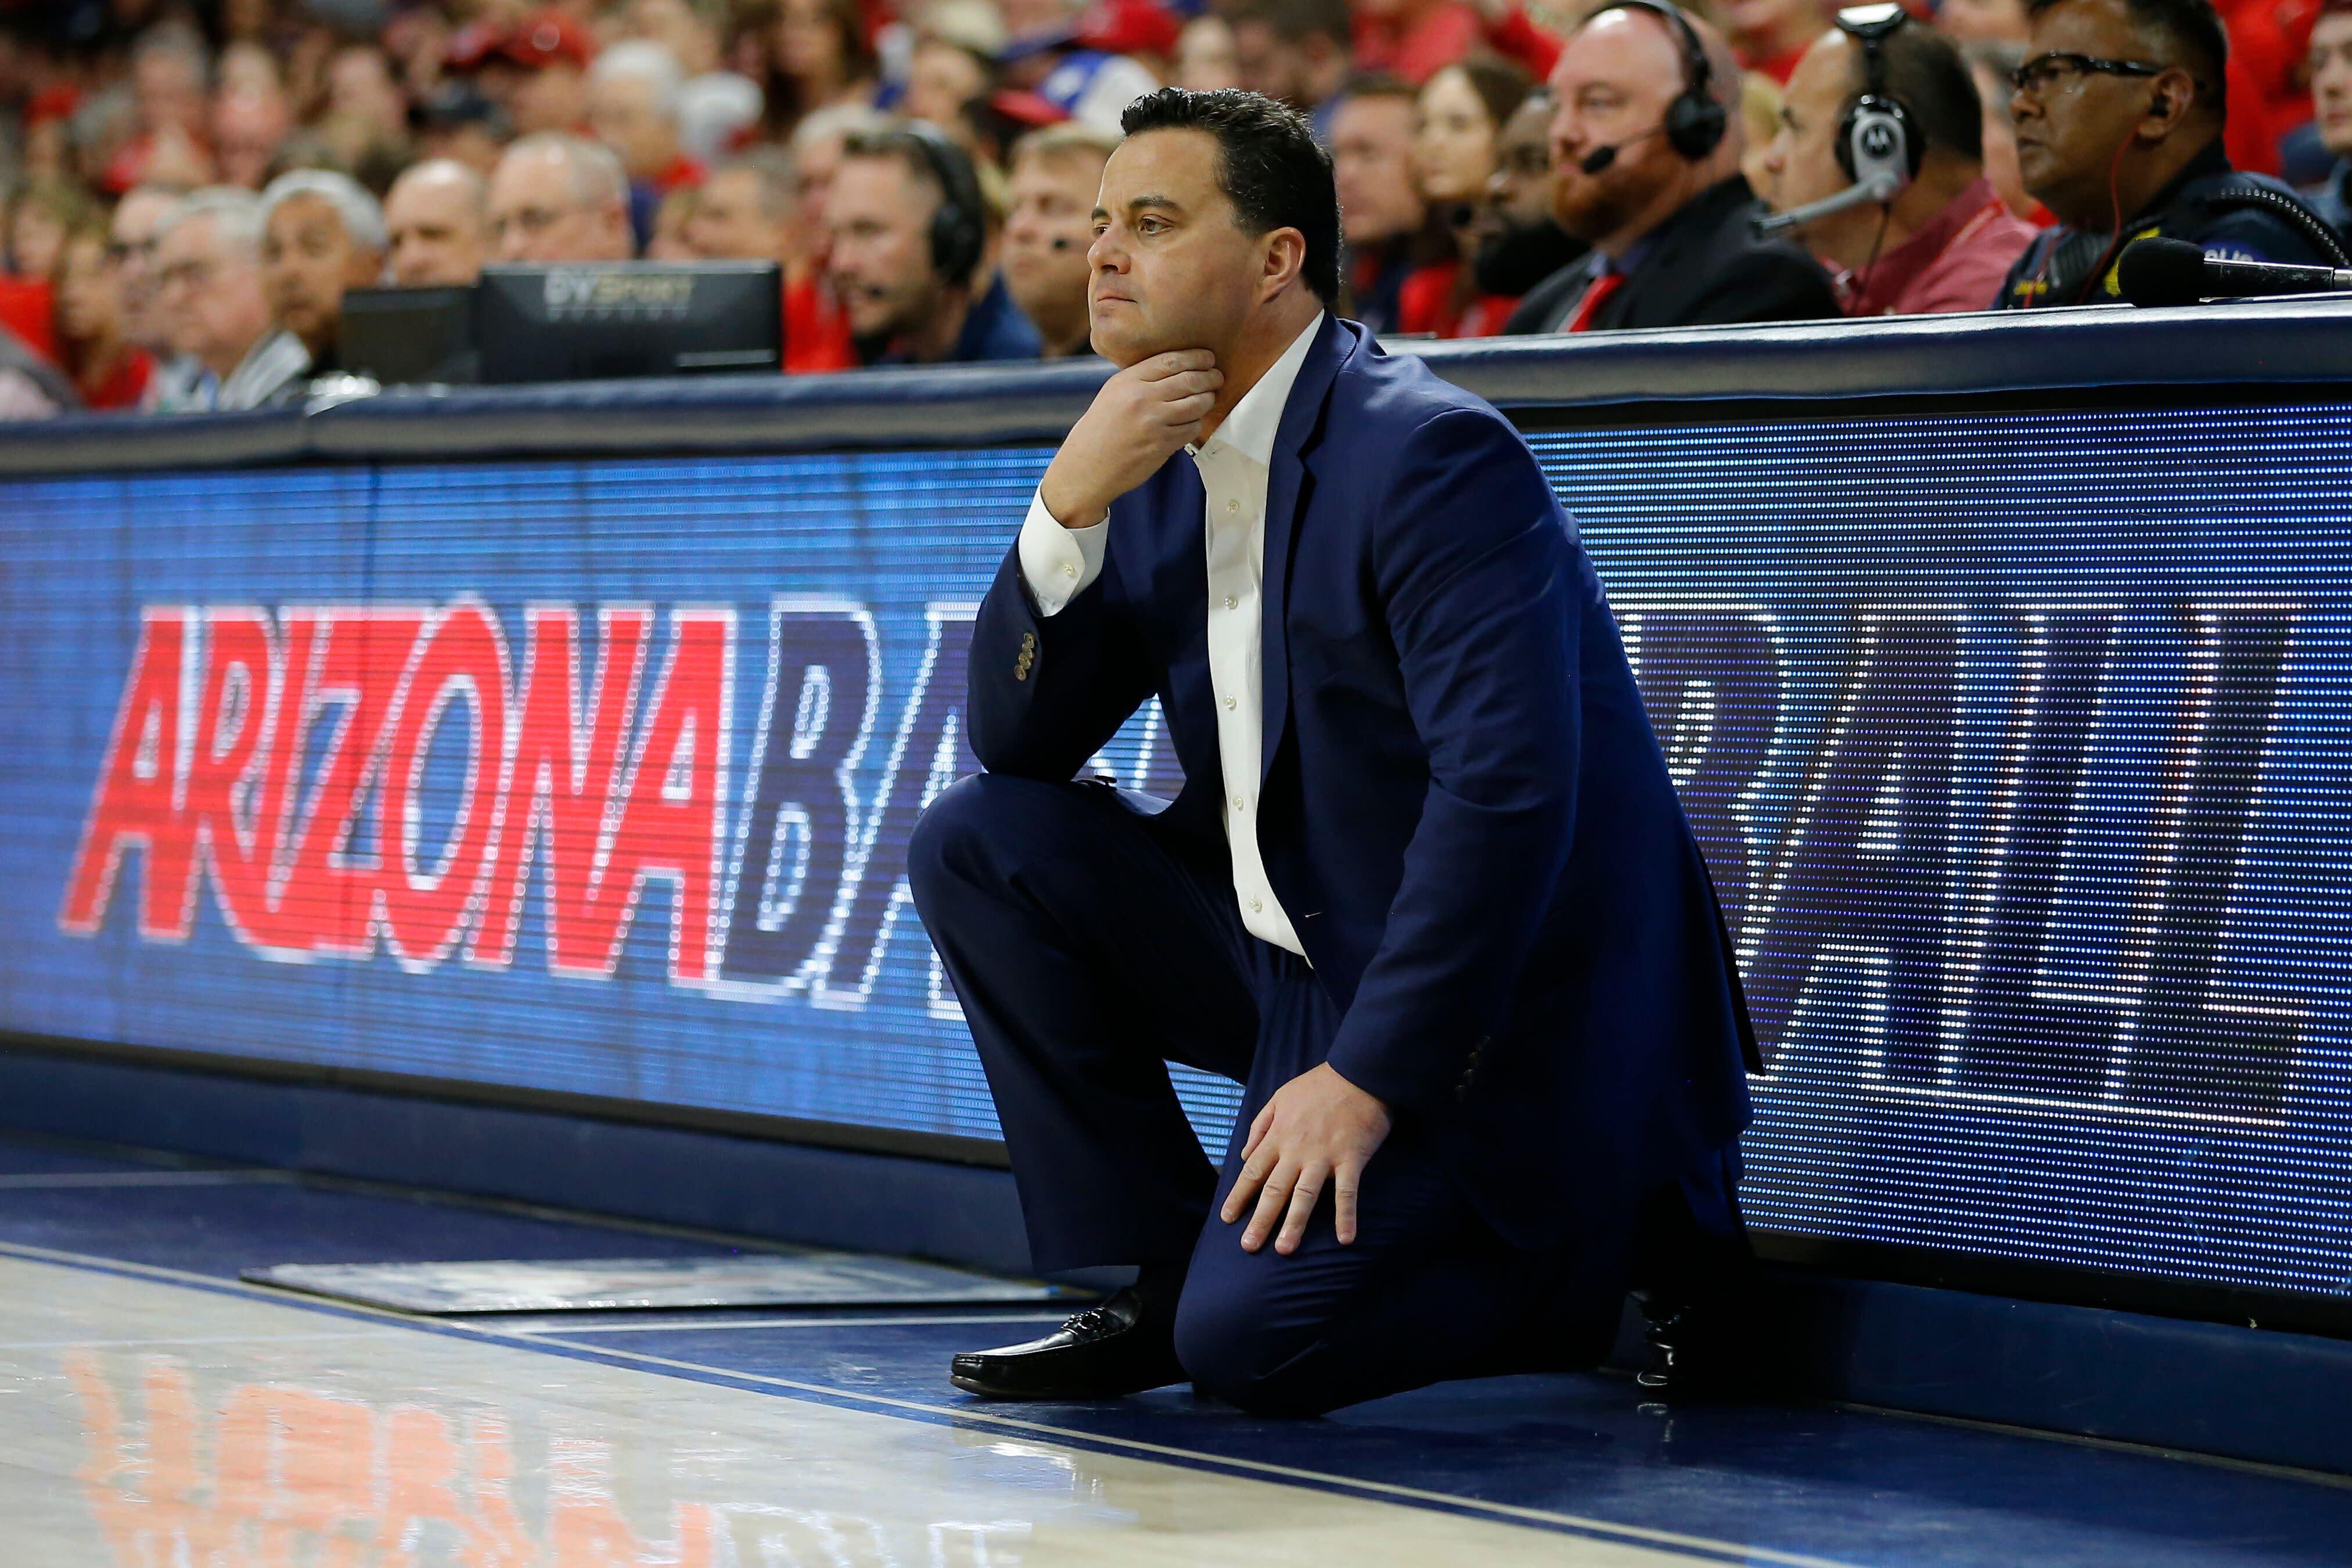 "<a class=""link rapid-noclick-resp"" href=""/ncaaf/teams/arizona/"" data-ylk=""slk:Arizona Wildcats"">Arizona Wildcats</a> head coach Sean Miller looks on during a college basketball game on March 9, 2019. (AP)"